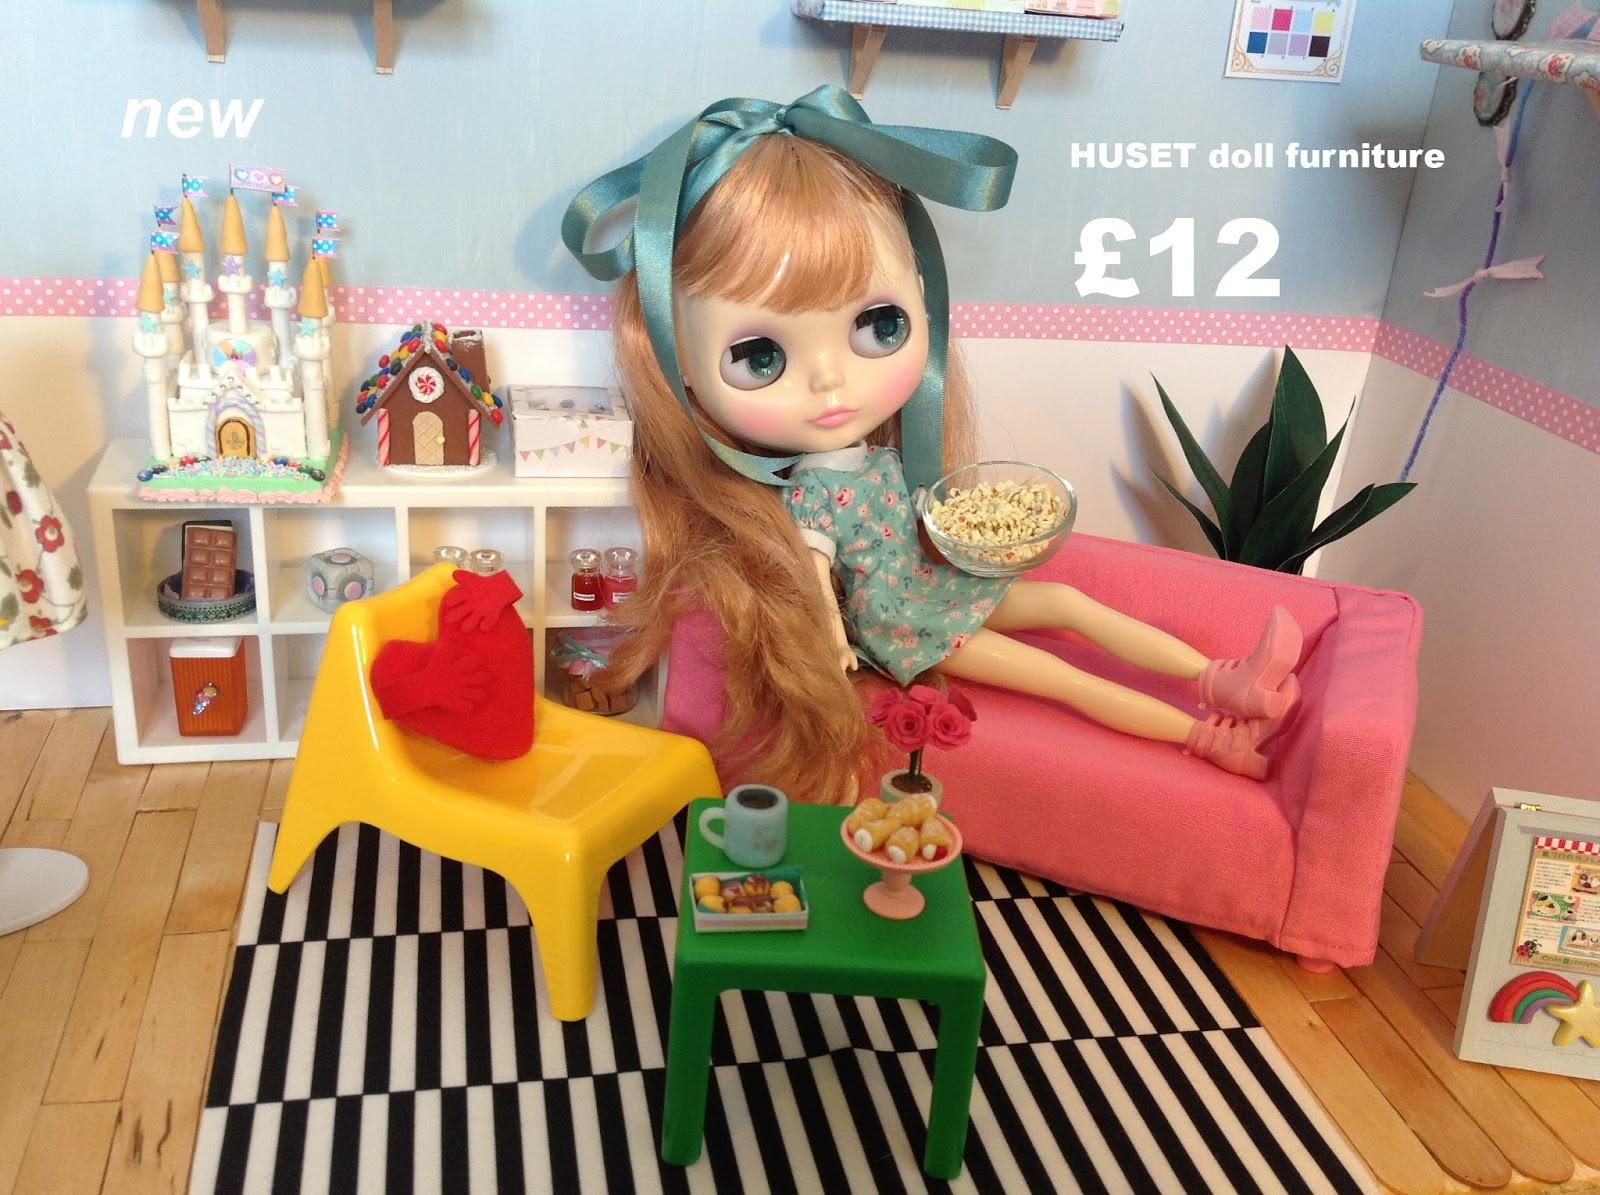 ikea huset doll furniture. Sadie Is Featured In The Spoof IKEA Catalogue Ikea Huset Doll Furniture U